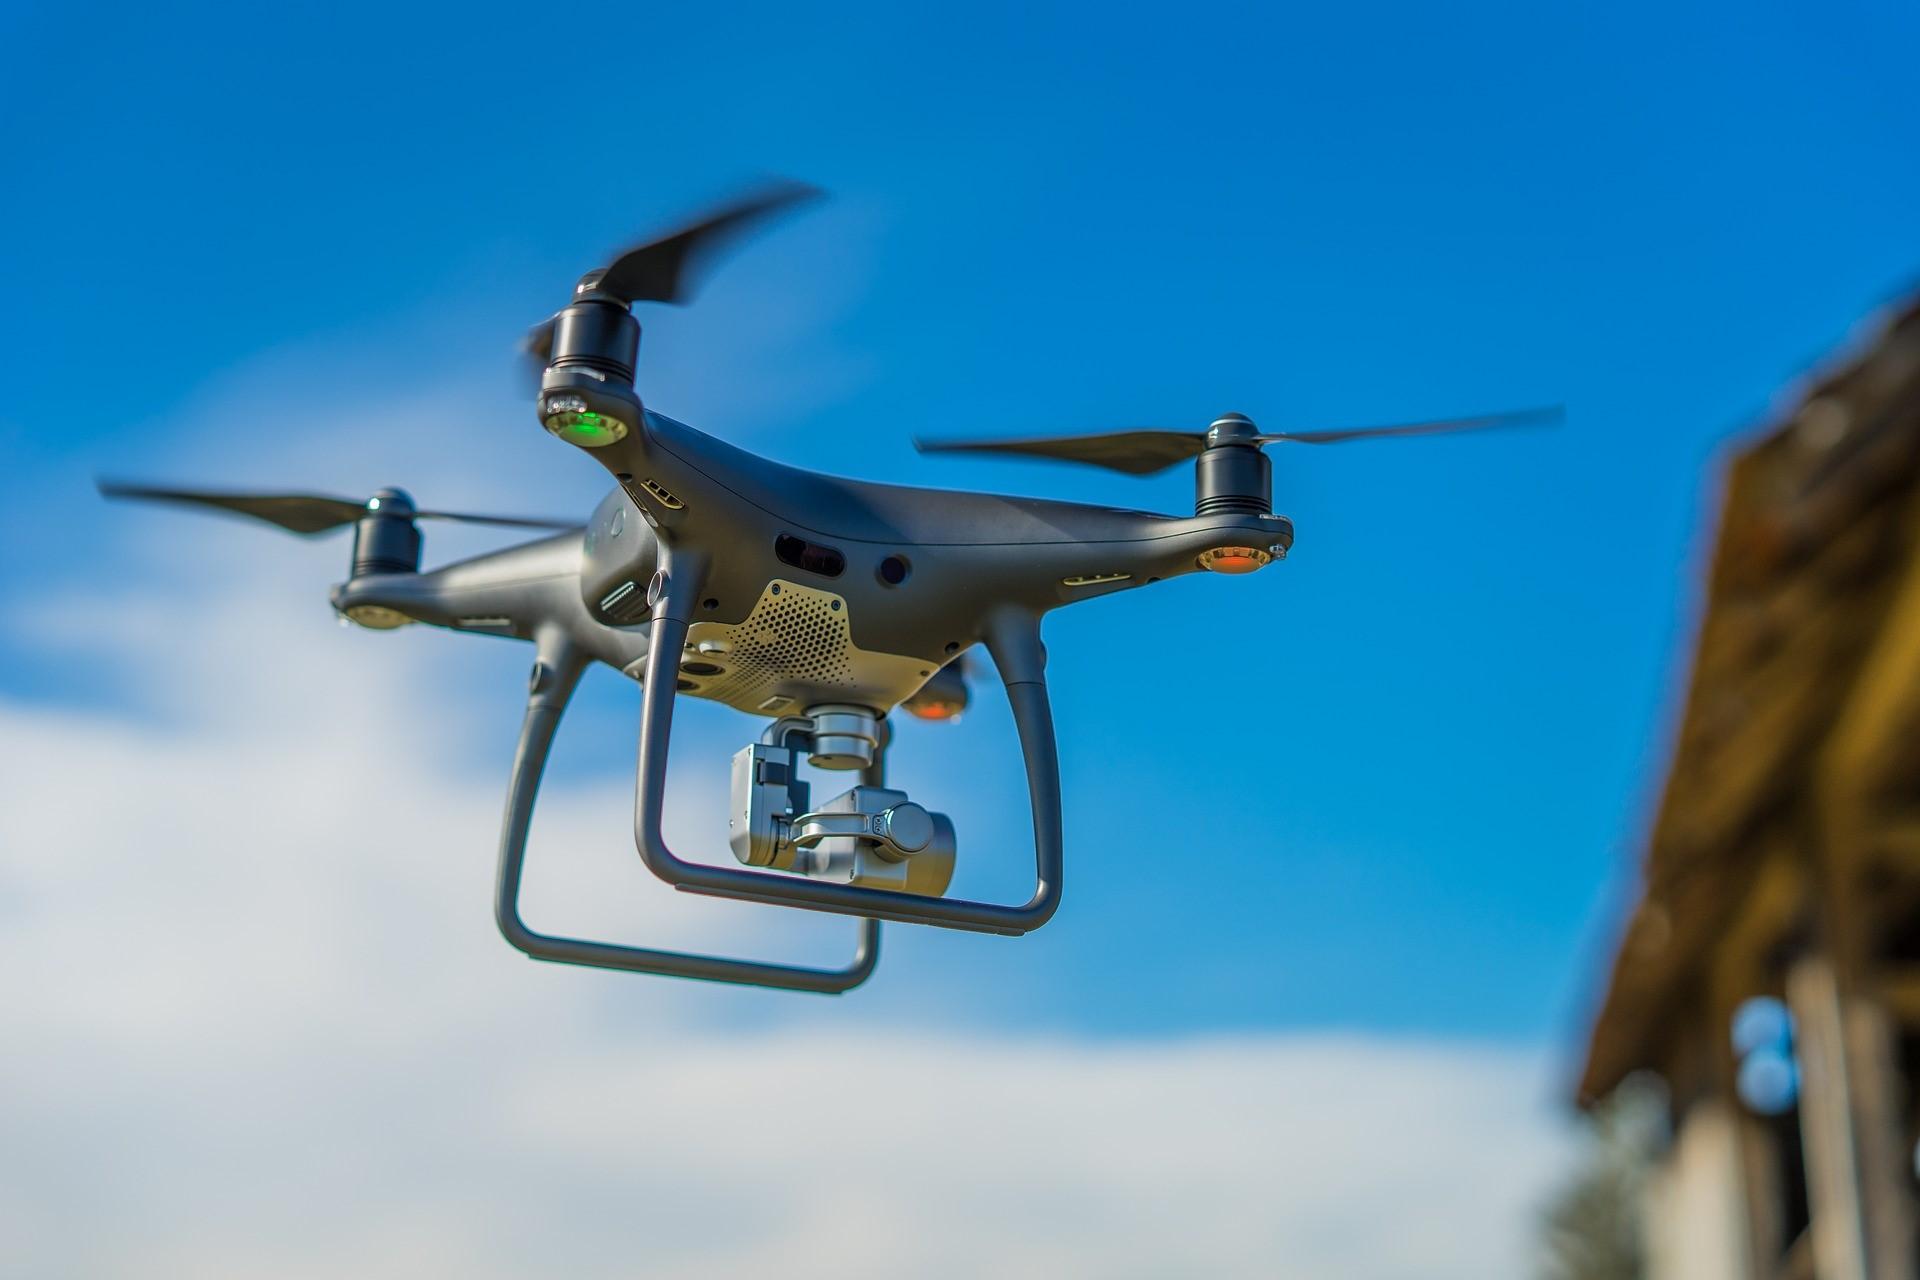 Elimco's E300 Having Fenix - Key Technologies for Drones